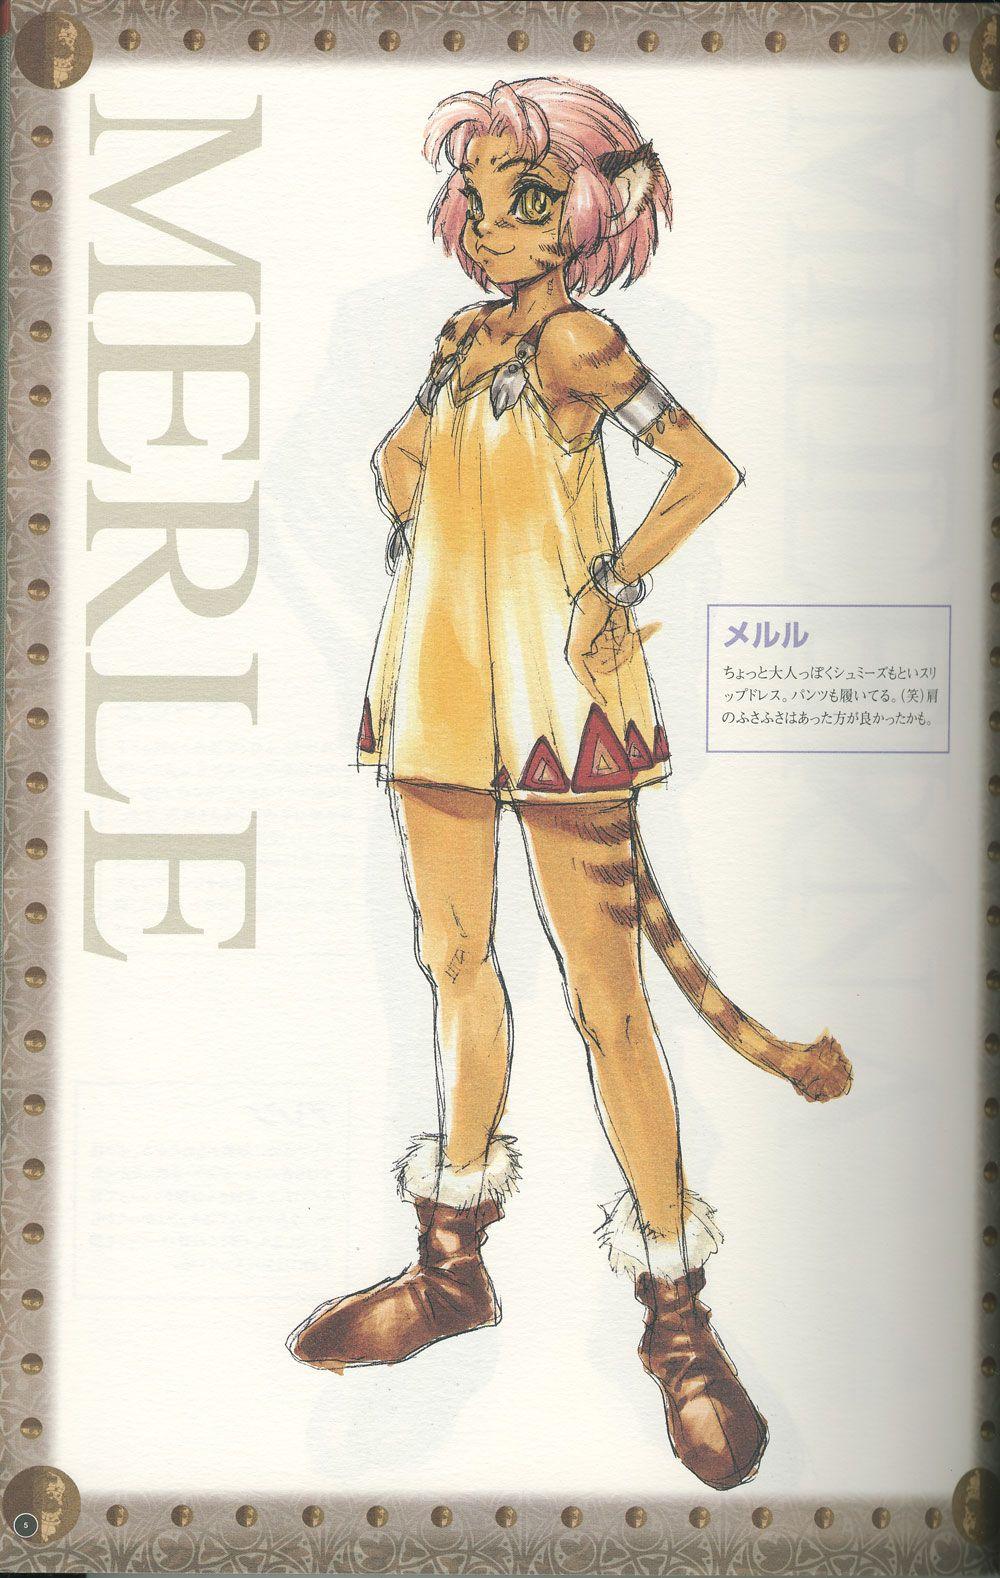 Merle cat girl from anime series Escaflowne Cat girl